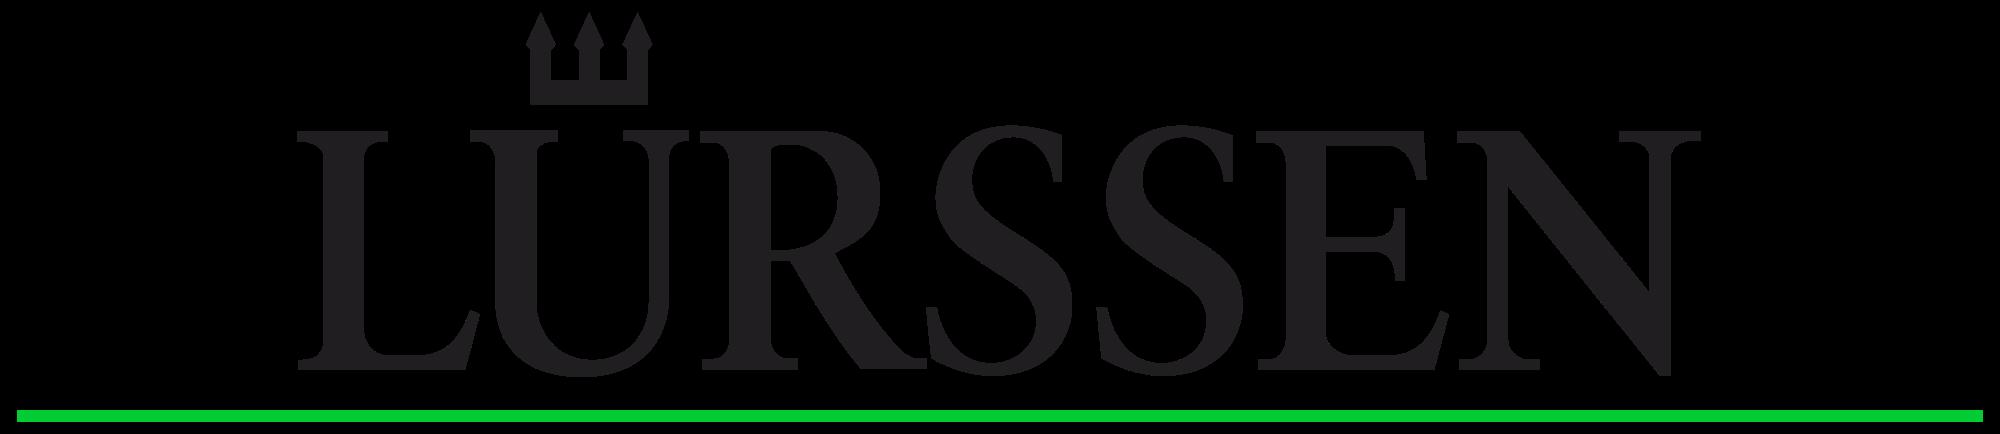 logo-lurssen